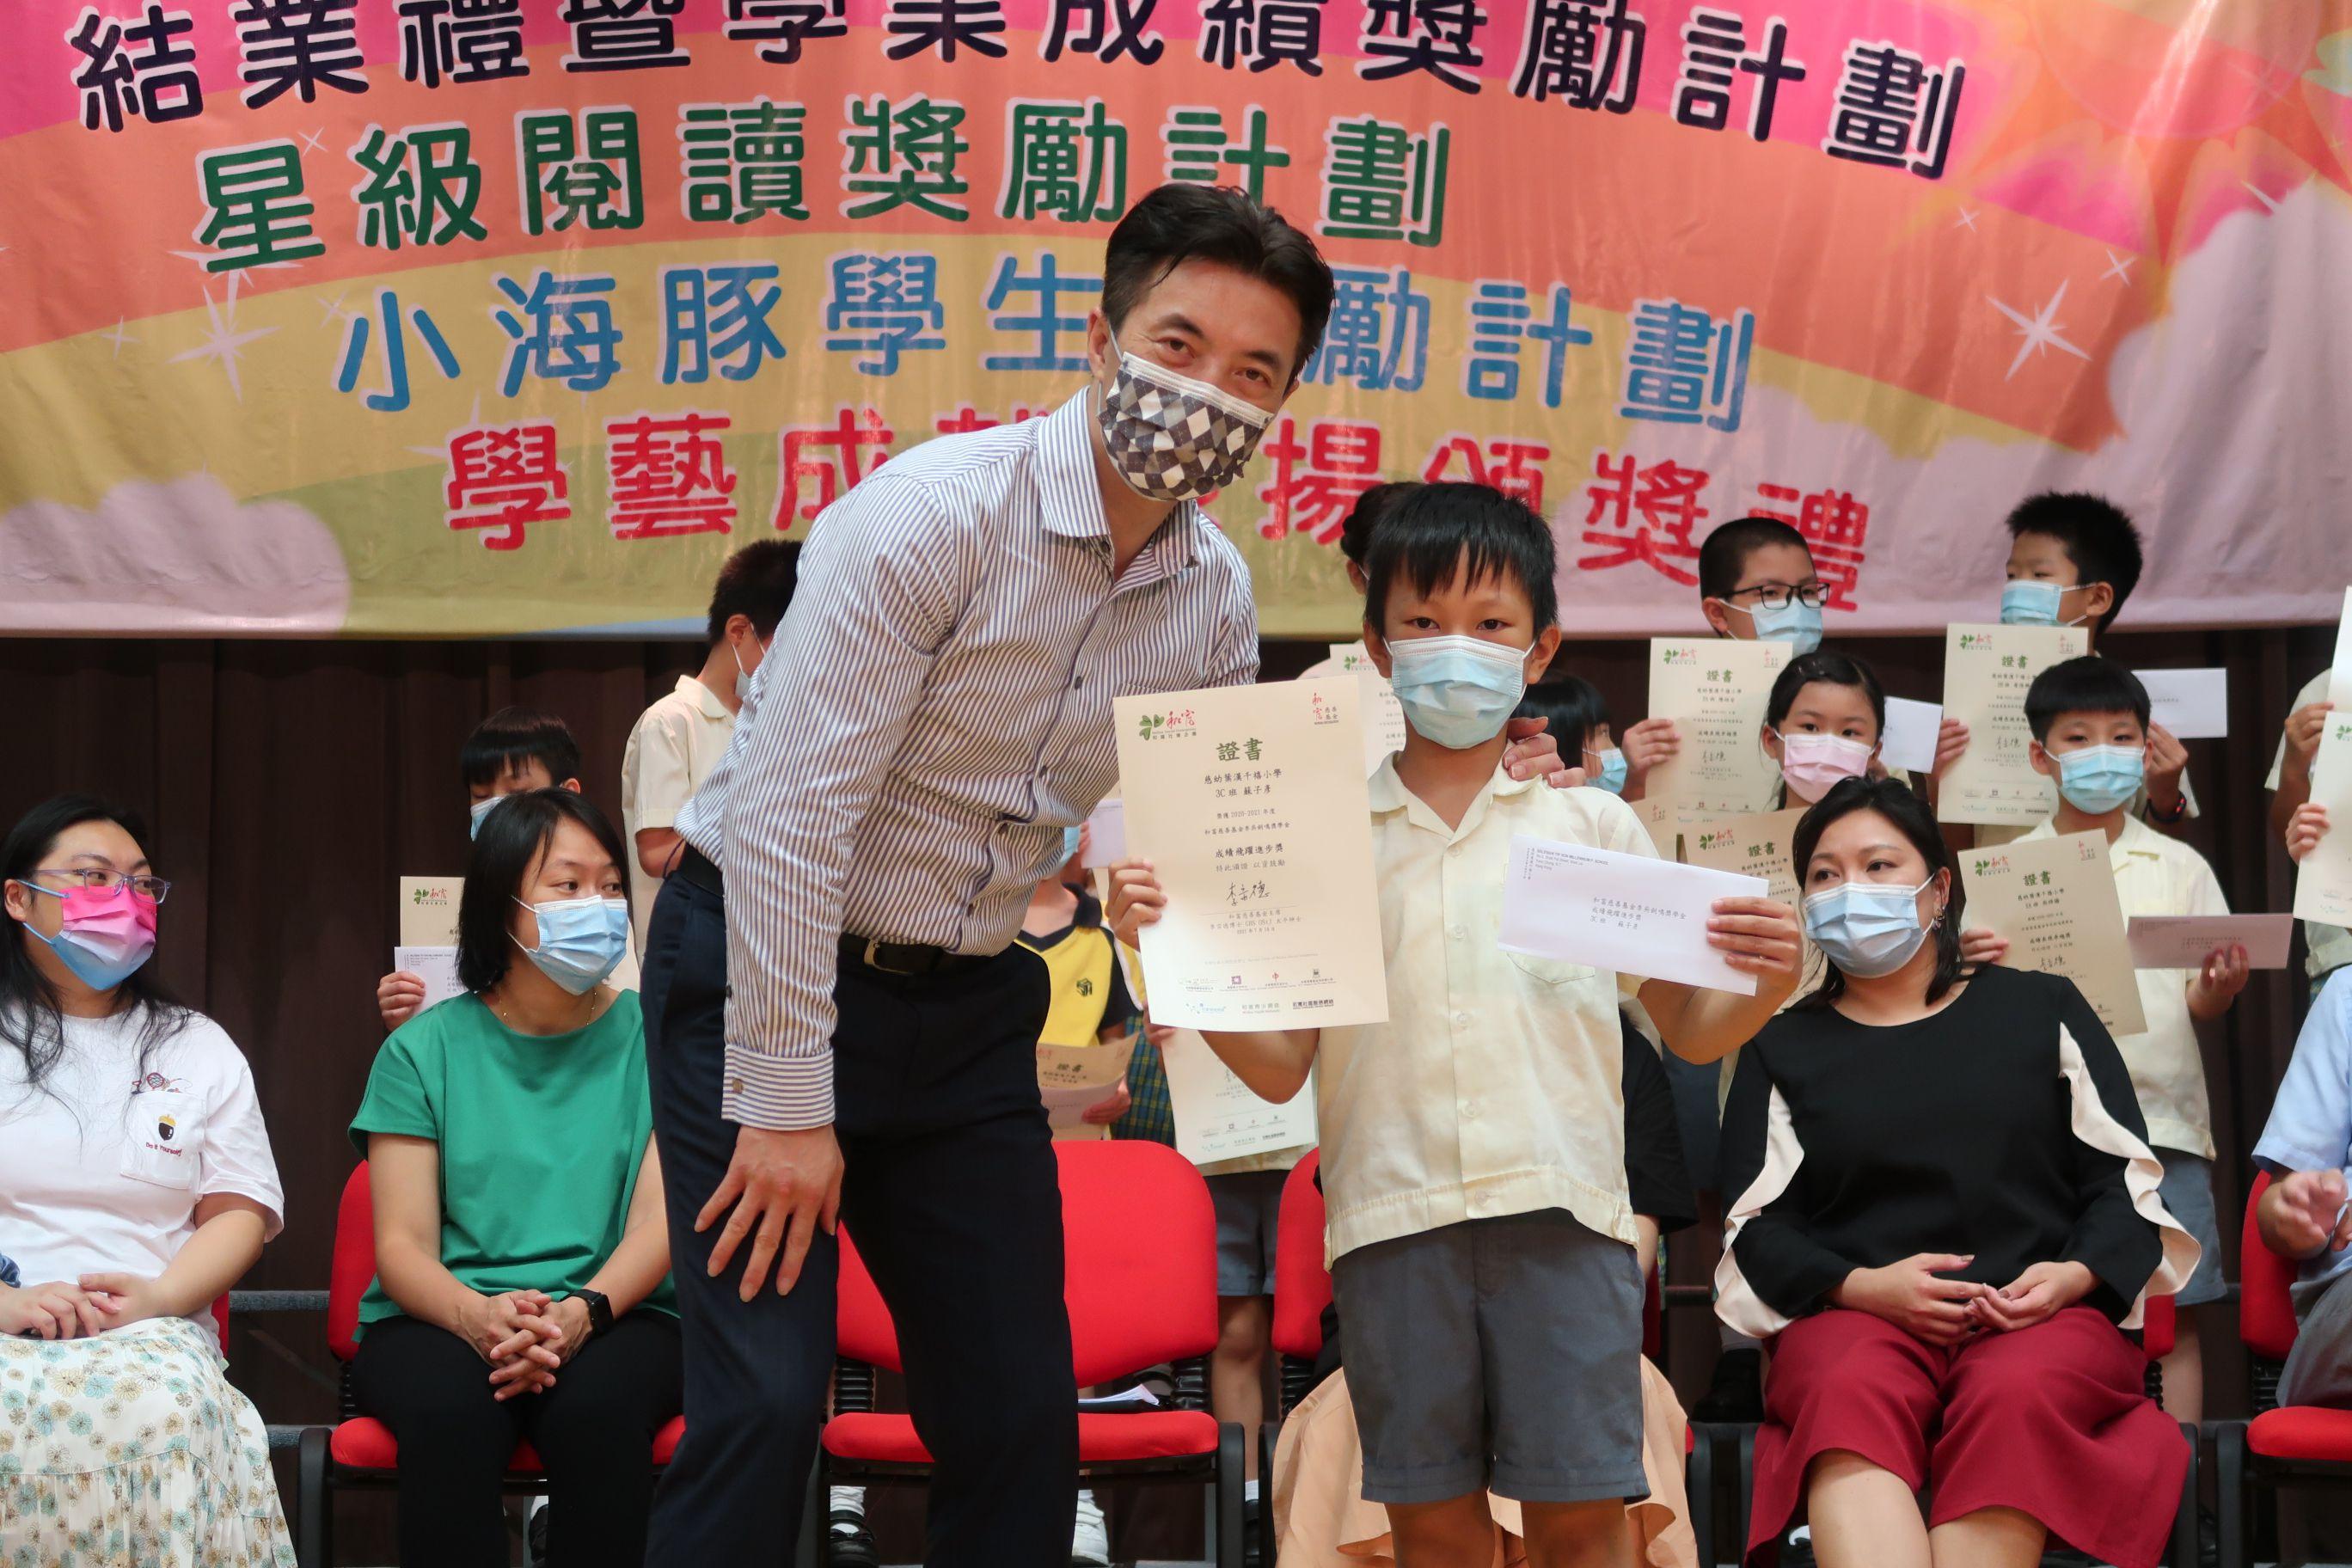 https://syh.edu.hk/sites/default/files/img_5946_1.jpg